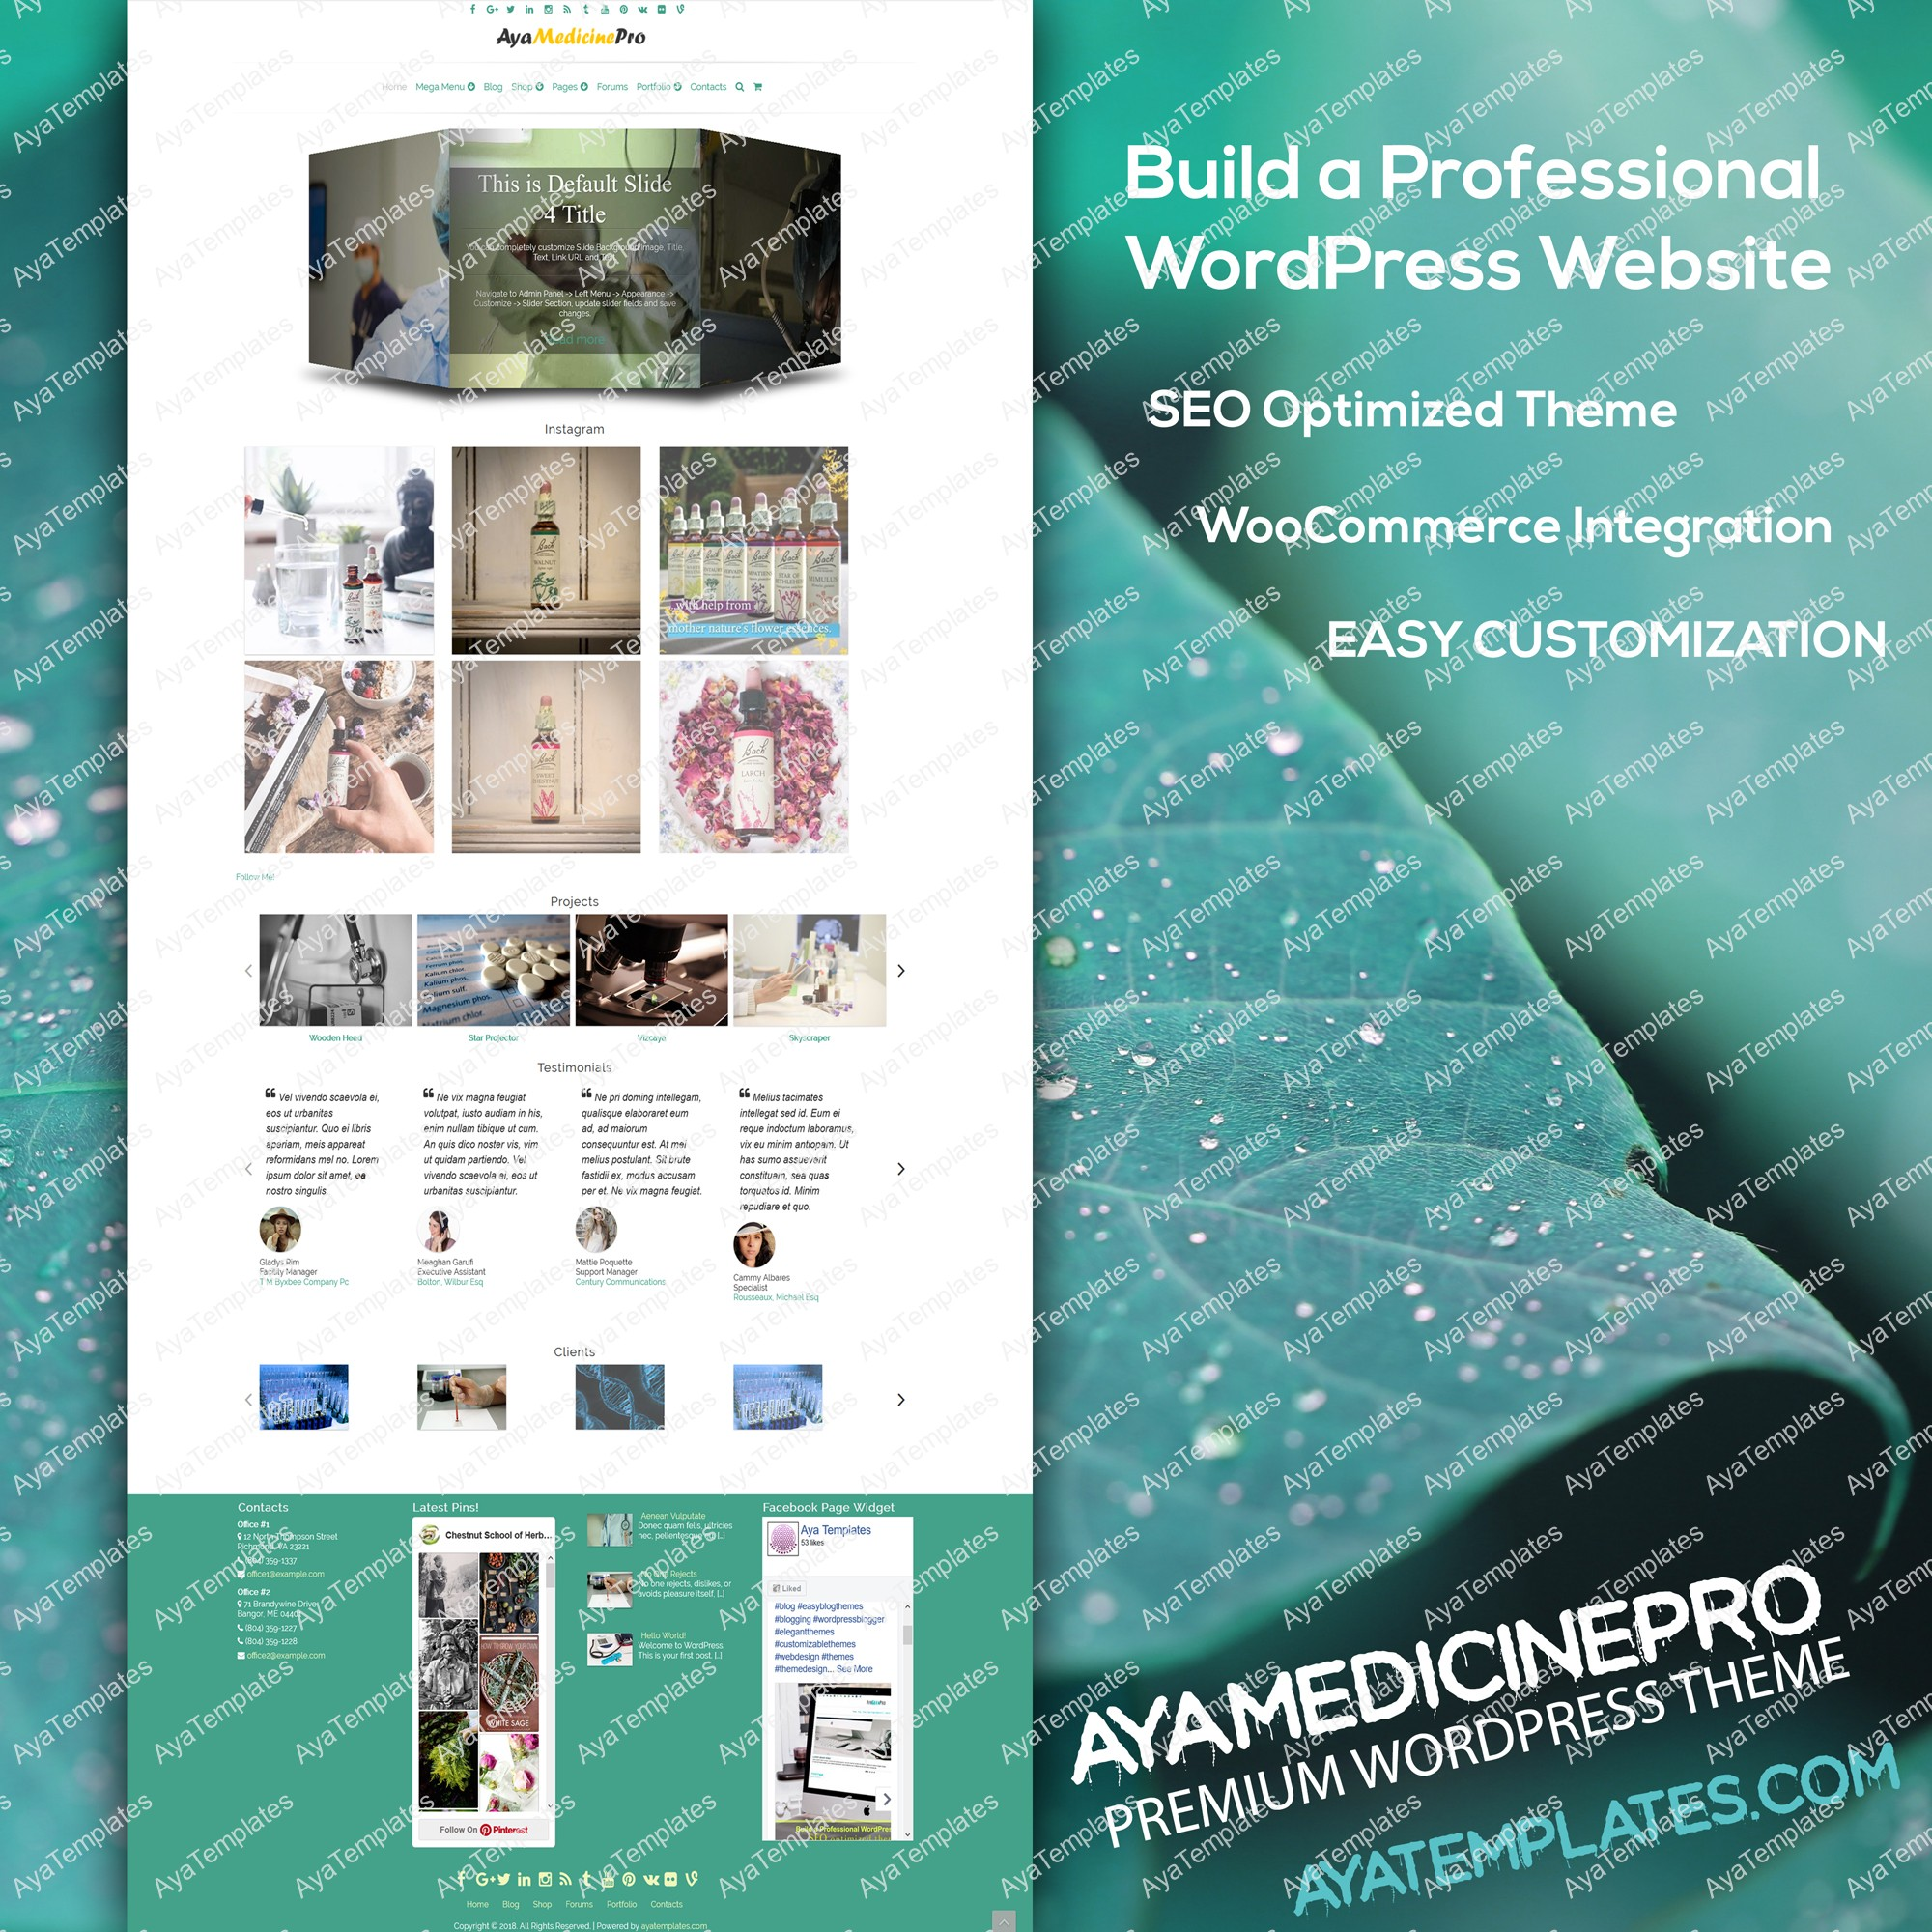 AyaMedicinePro-premium-wordpress-theme-mockup-ayatempates